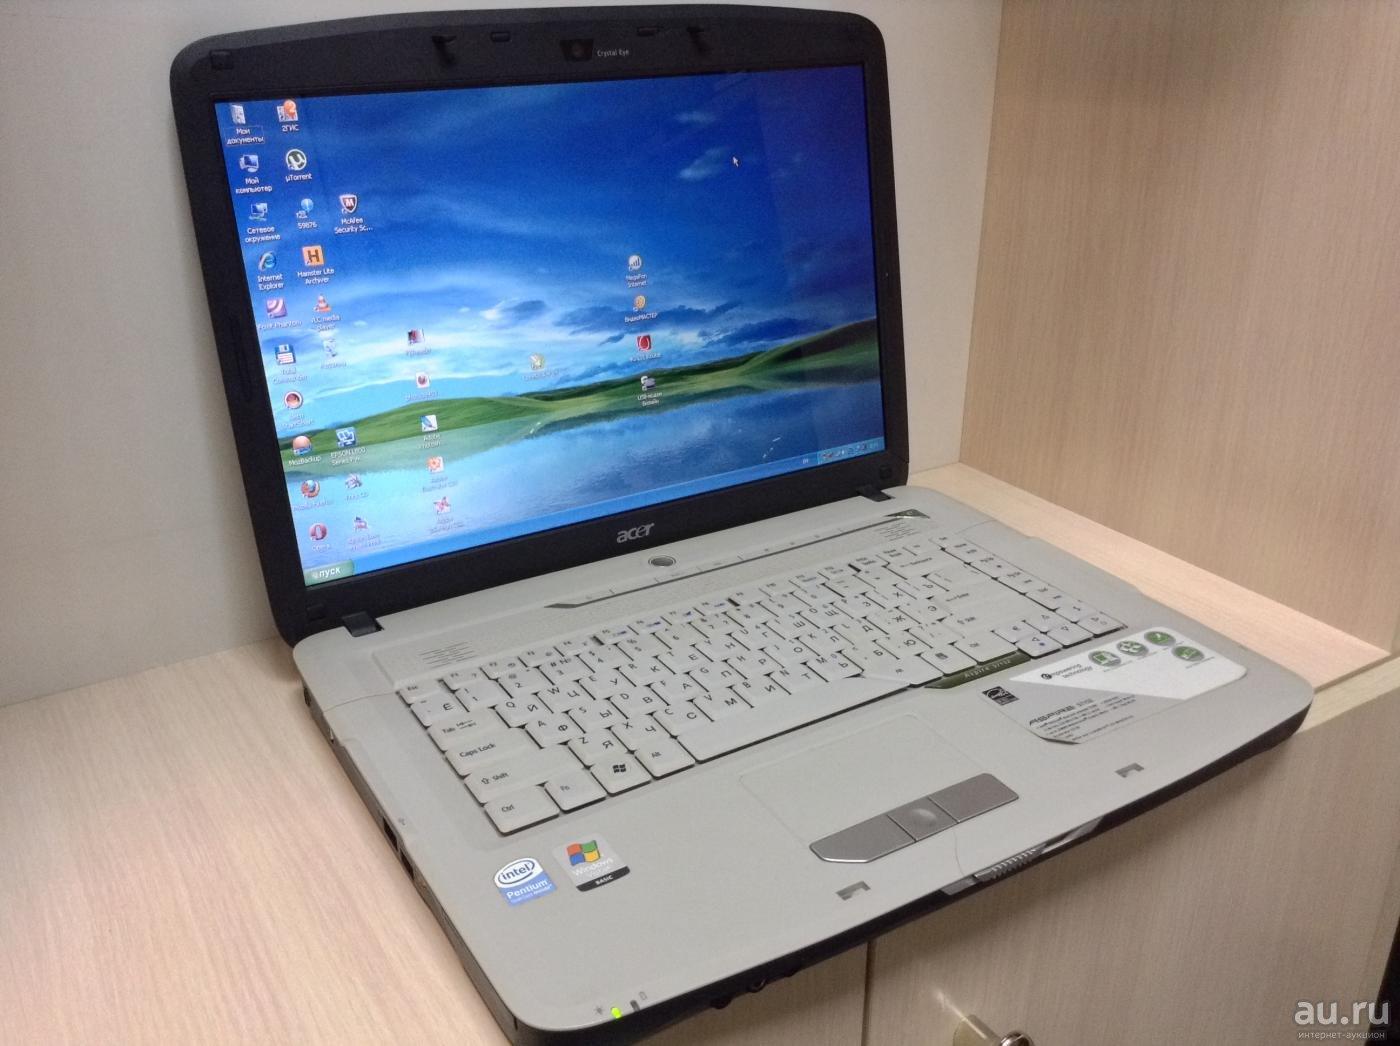 Ноутбук ACER ASPIRE 5715Z за 5000!!!